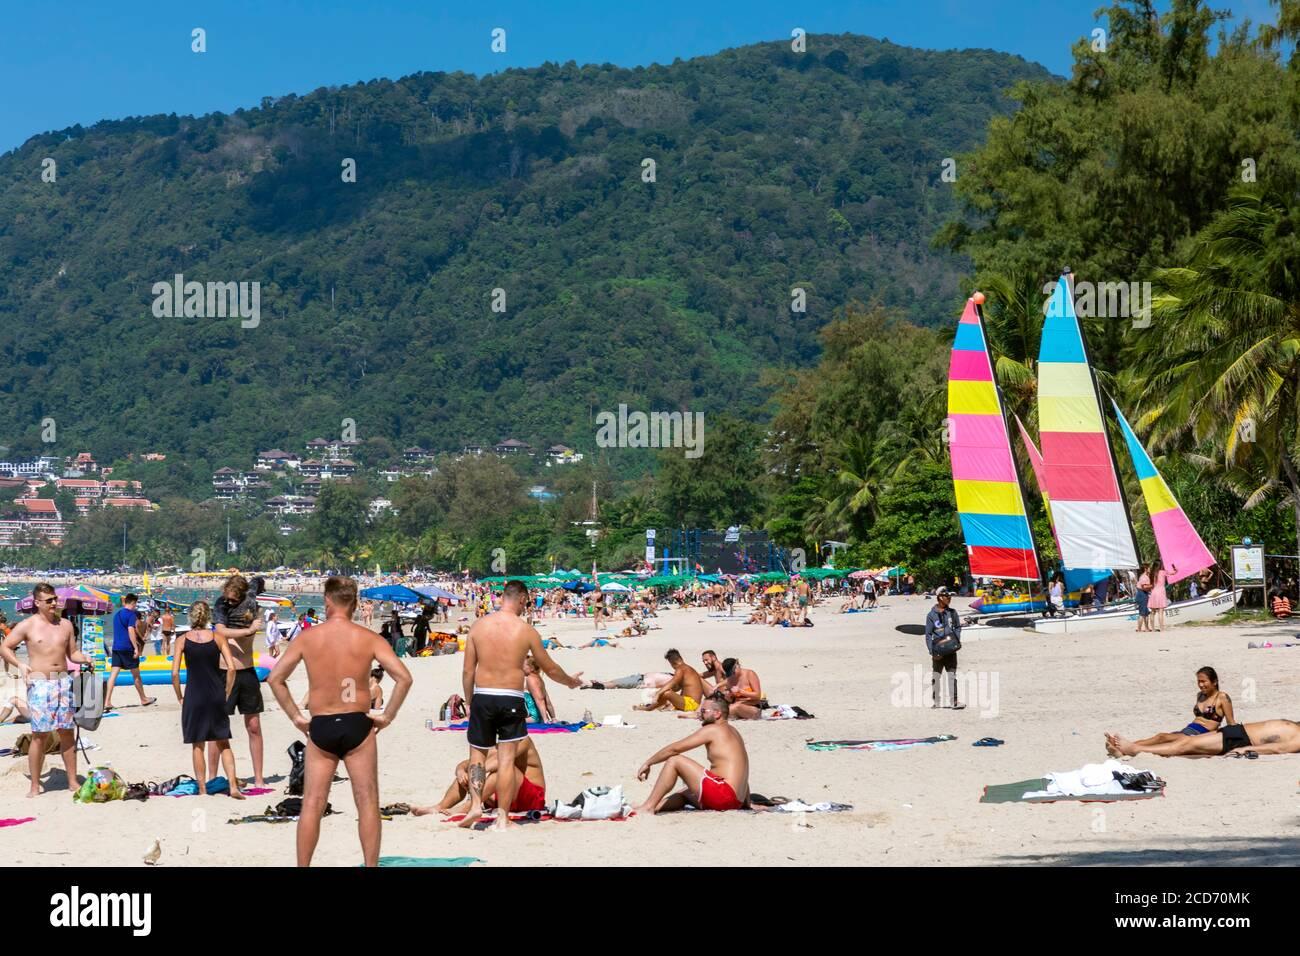 Touristen am Strand von Patong, Phuket, Thailand Stockfoto